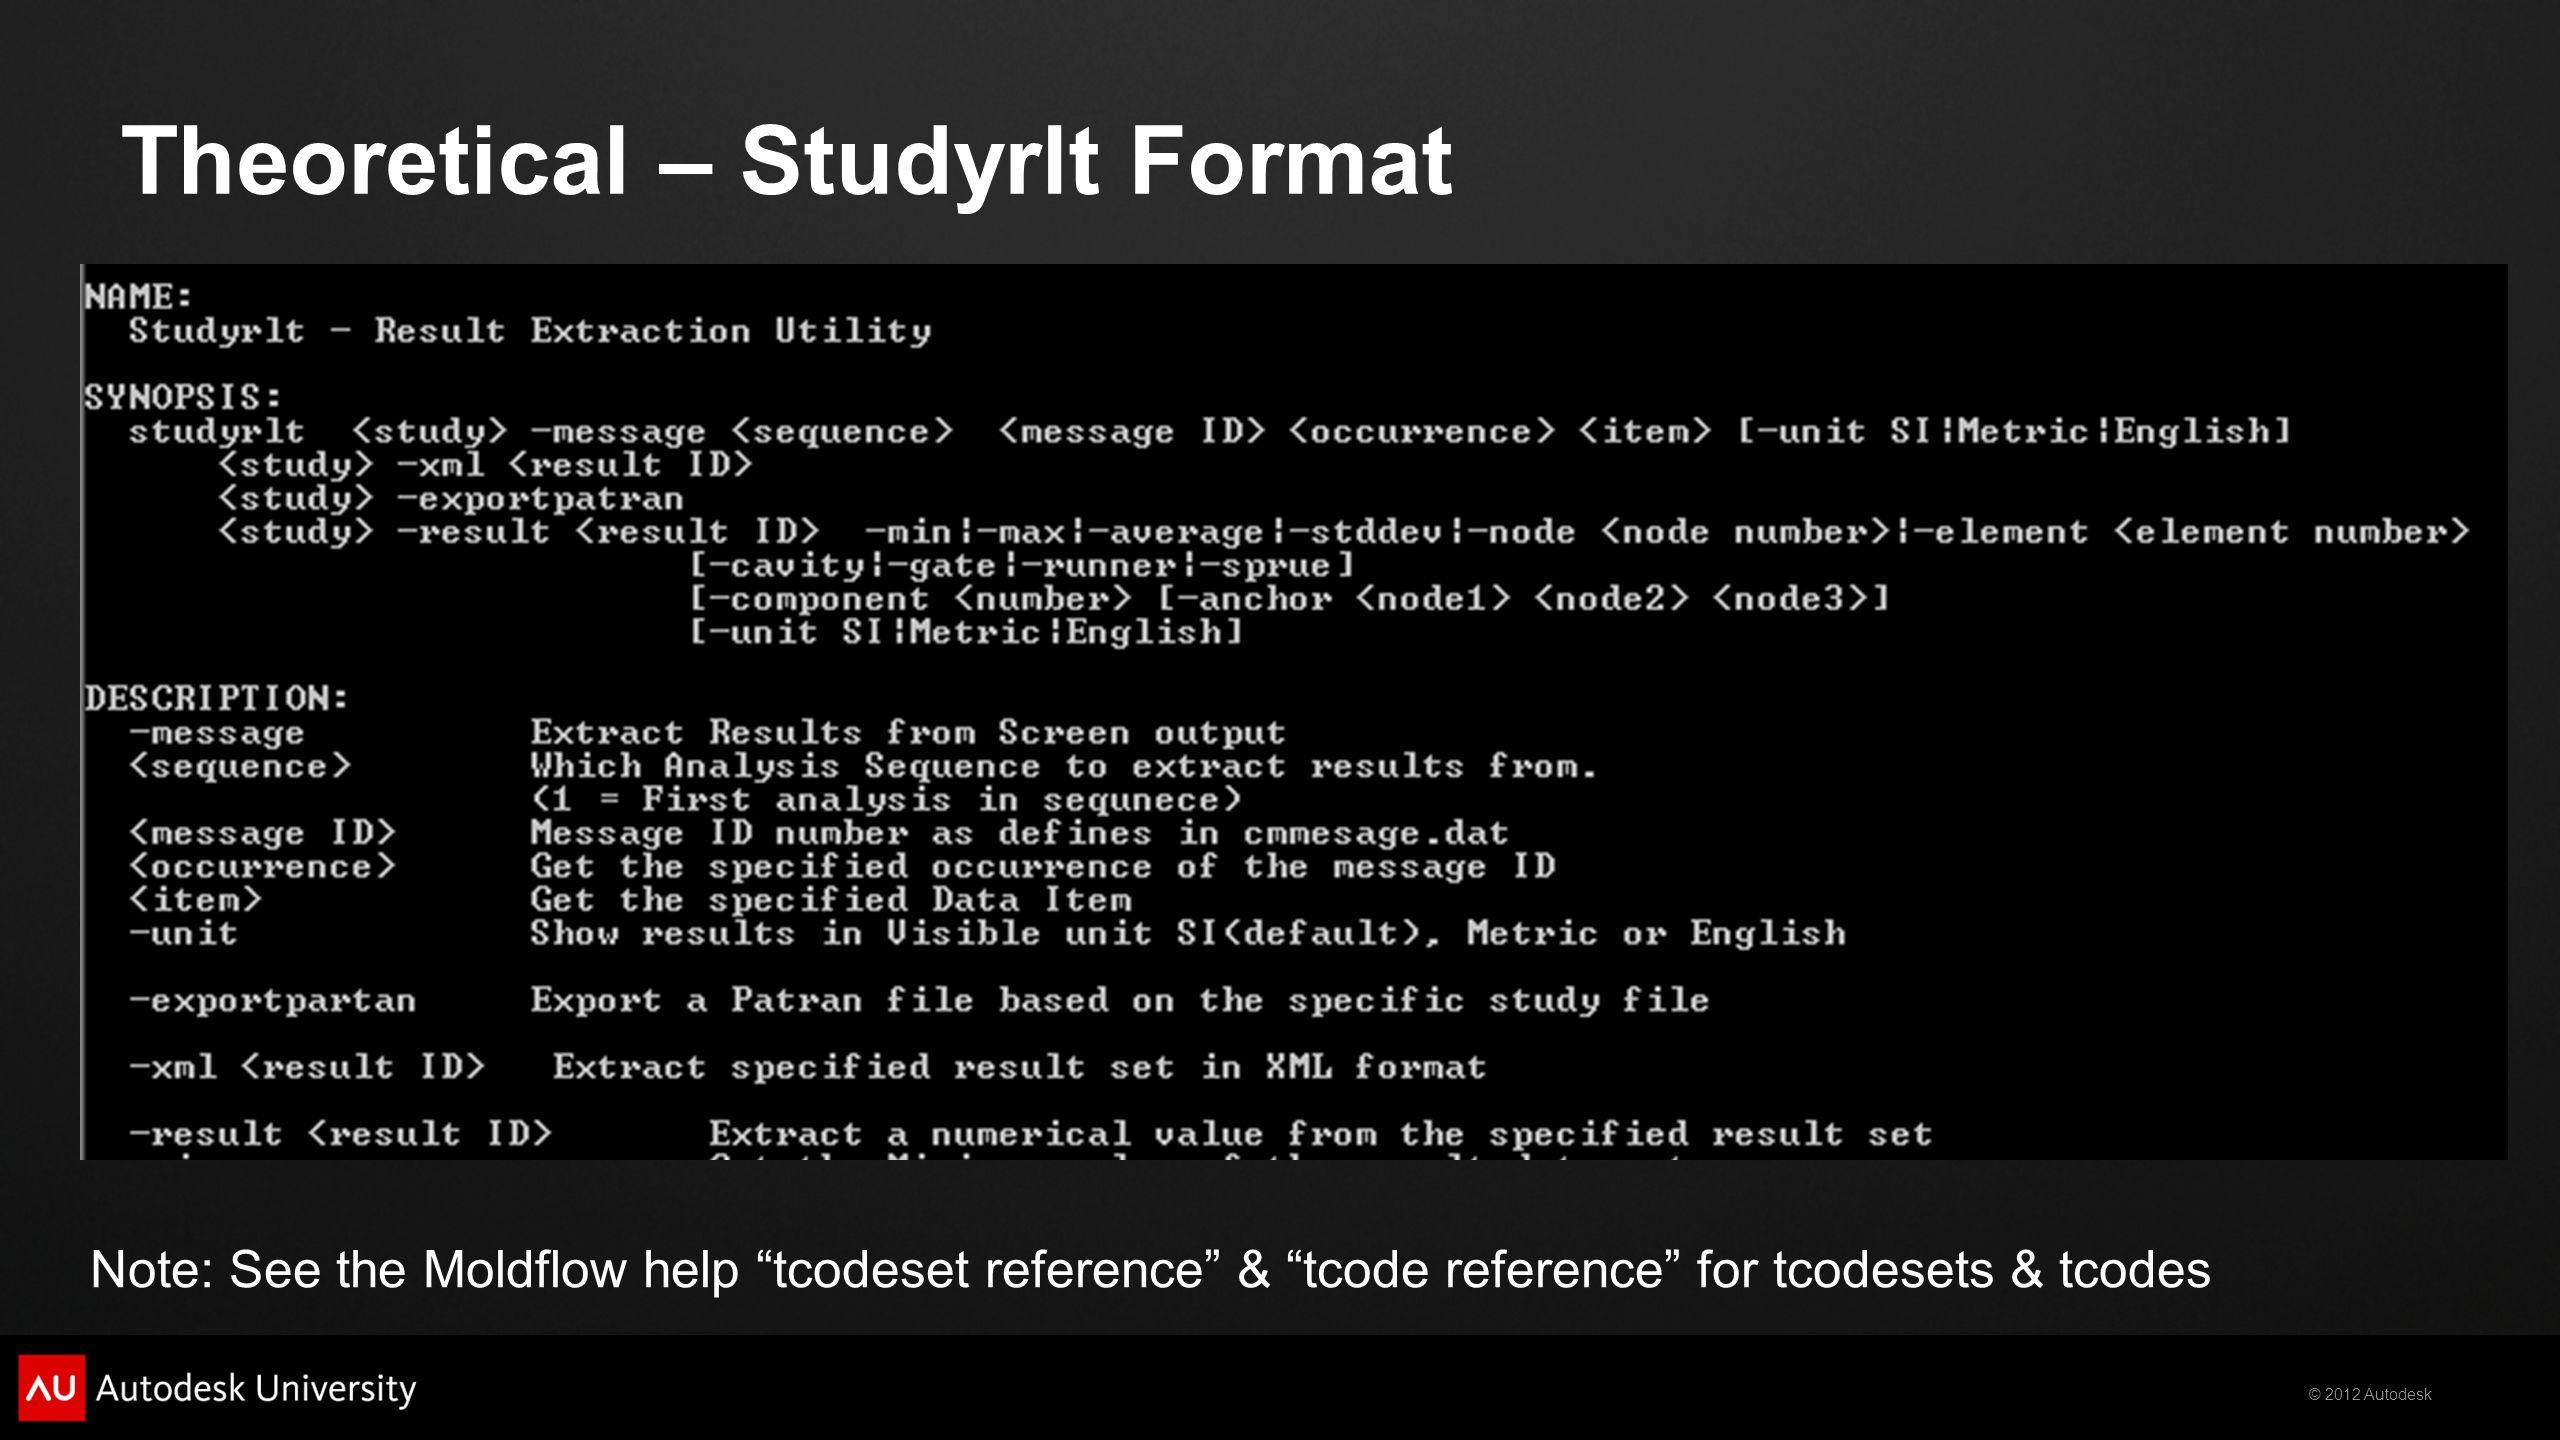 Theoretical – Studyrlt Format